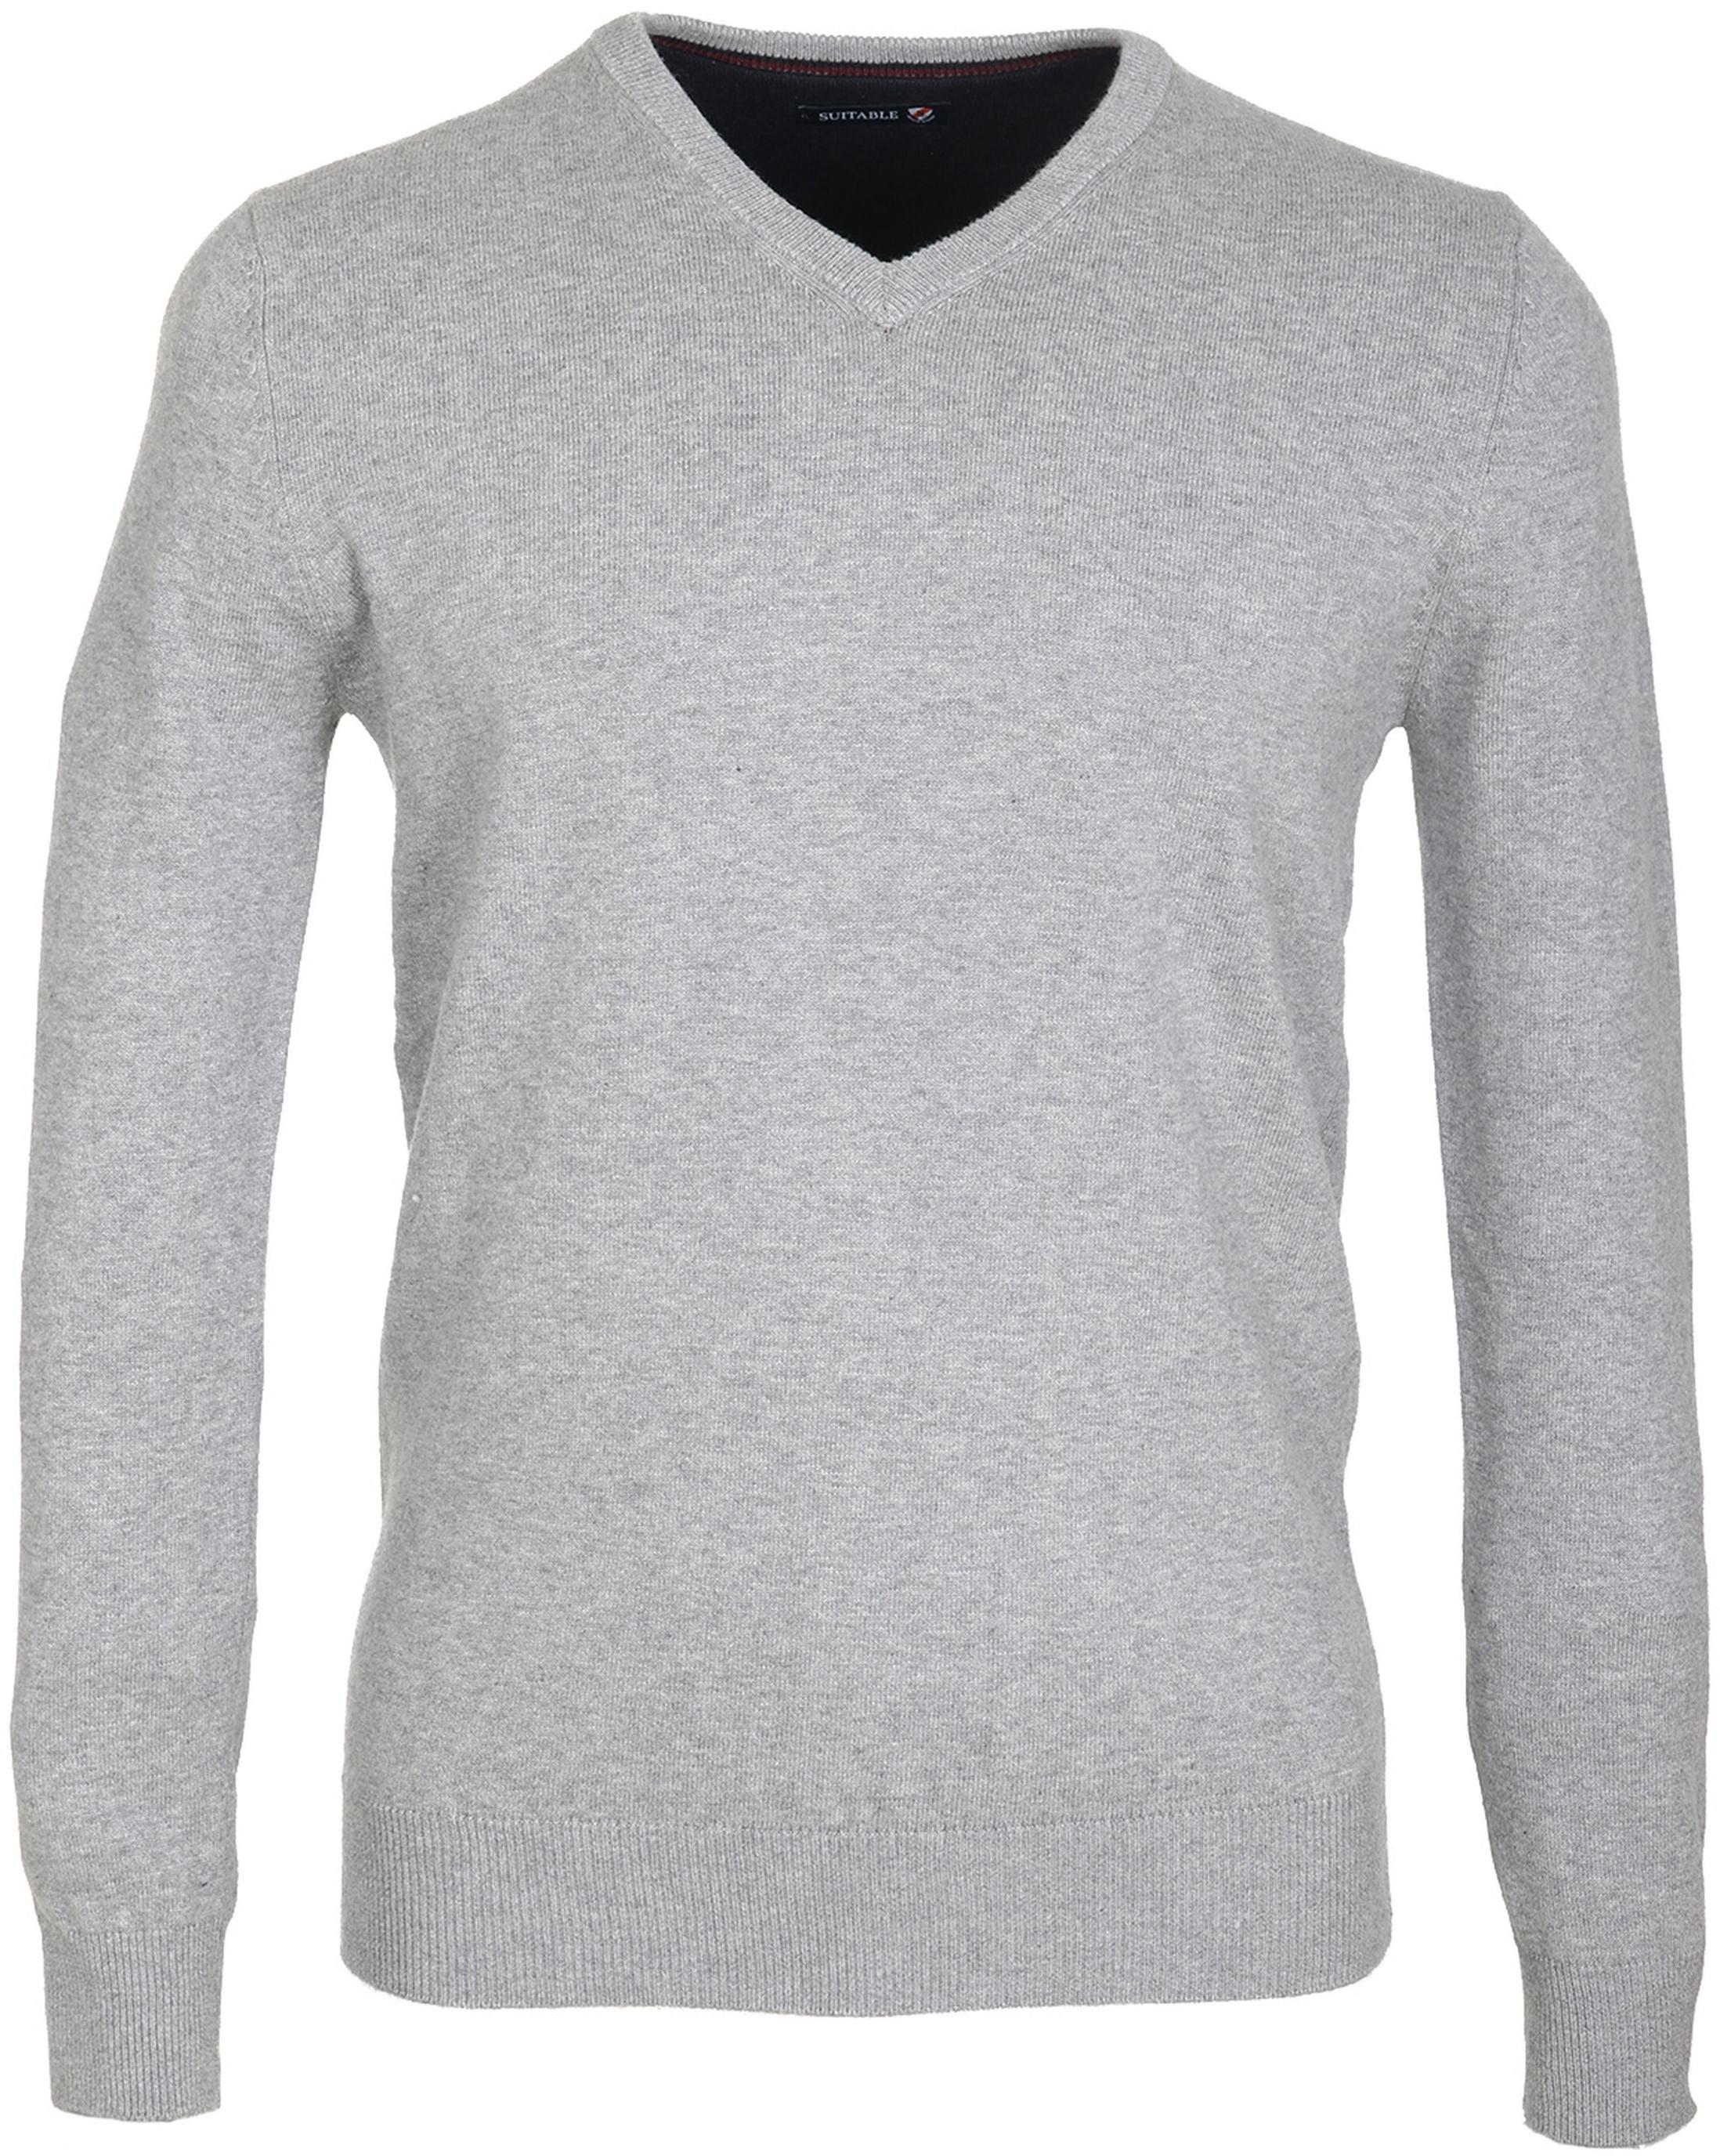 buy online 95a7b c92d8 Suitable Pullover Baumwolle Grau SPE17305VI01ST-940 online ...